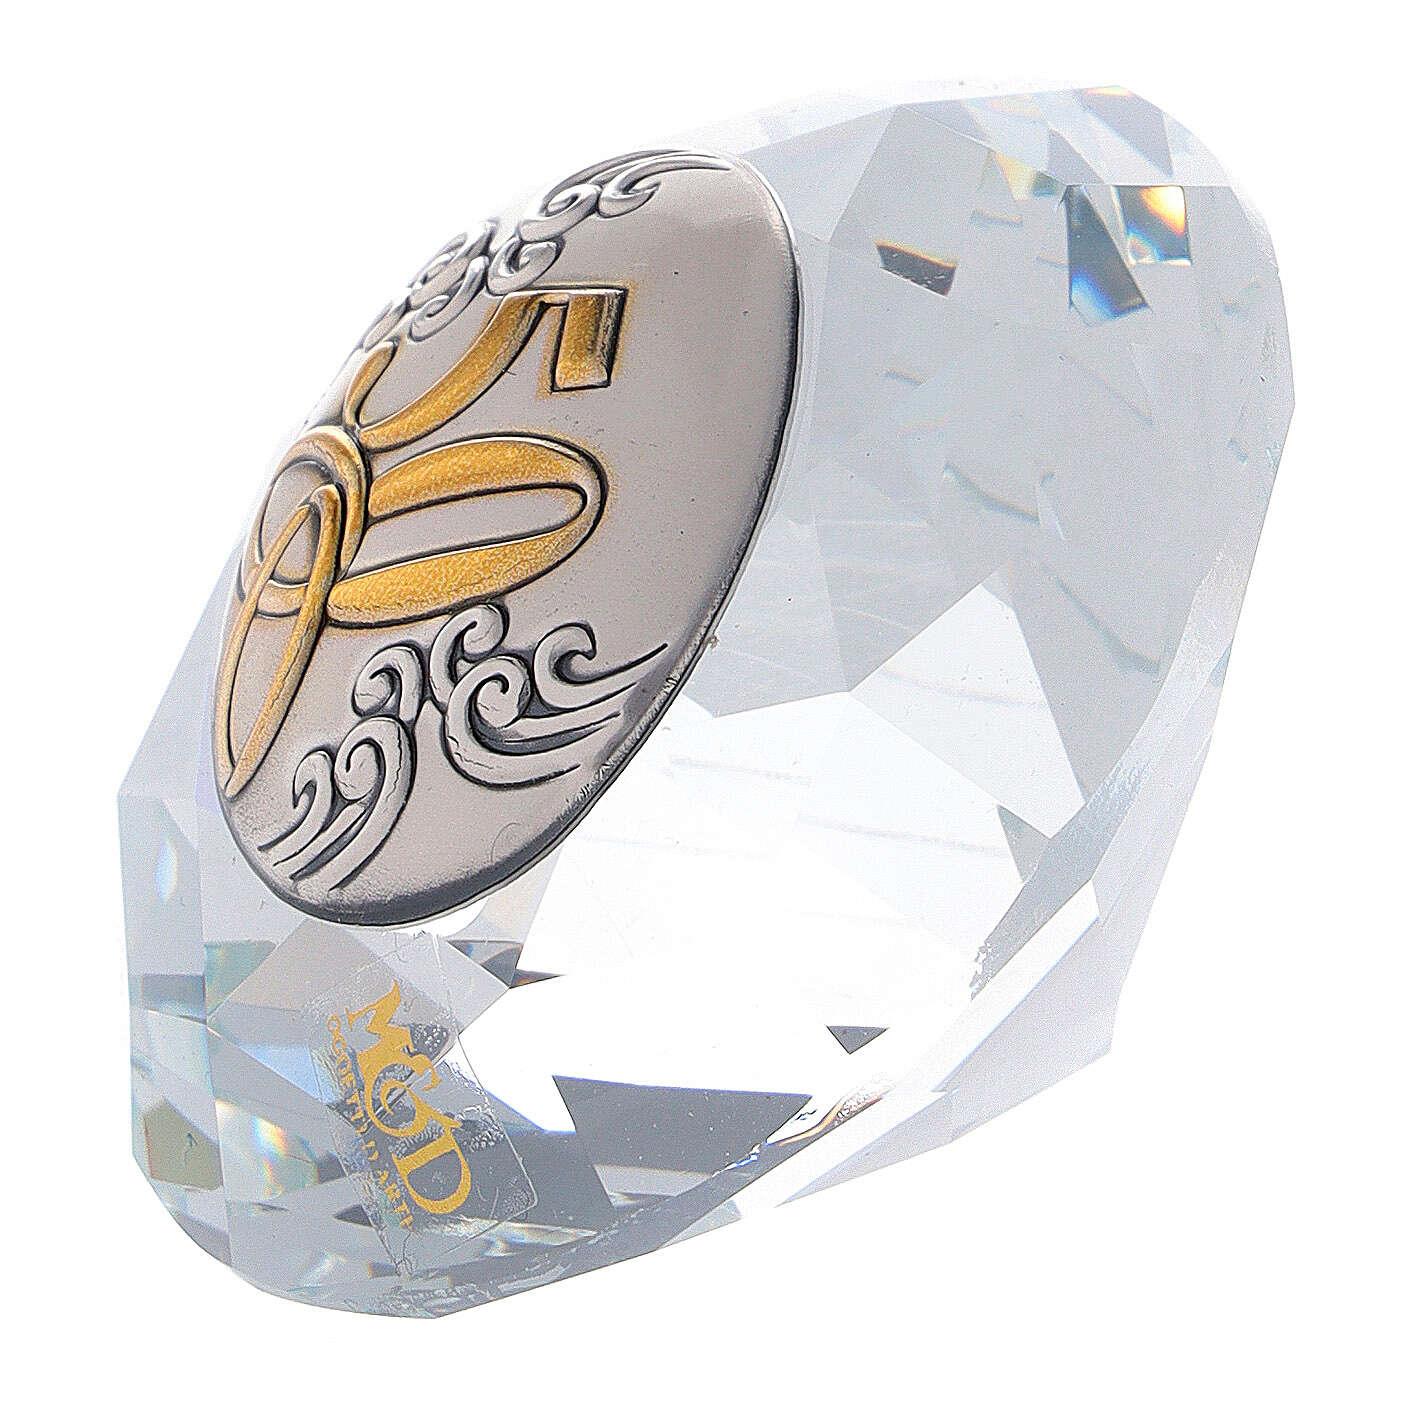 Glass diamond golden wedding favor 3